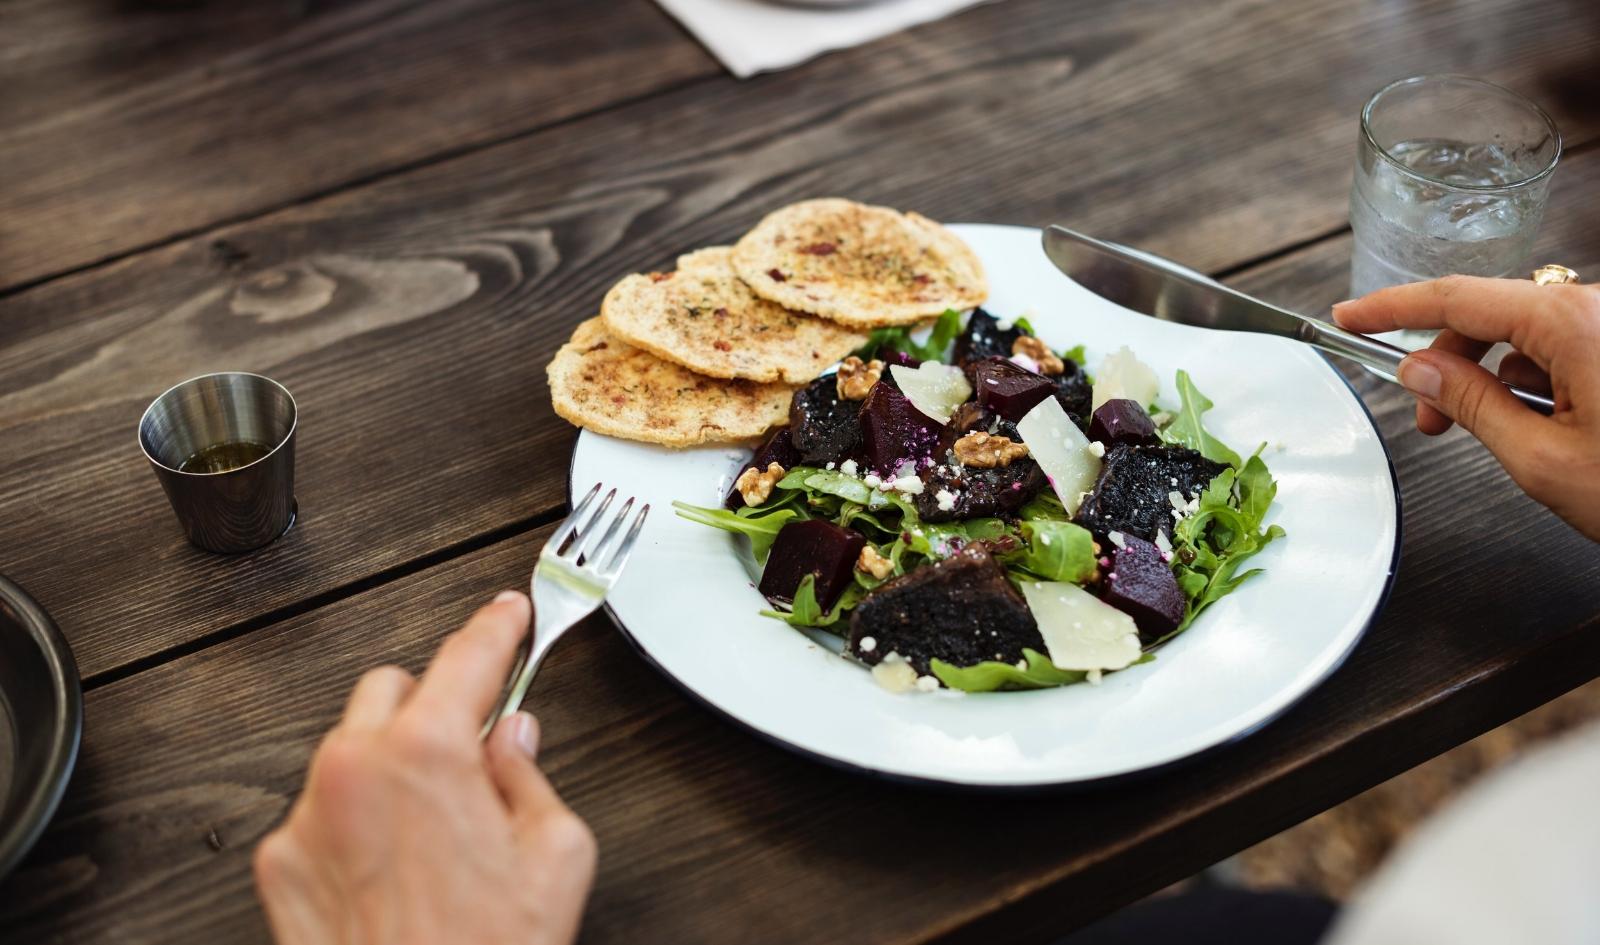 salads-digestion-relax-slow-food.jpg